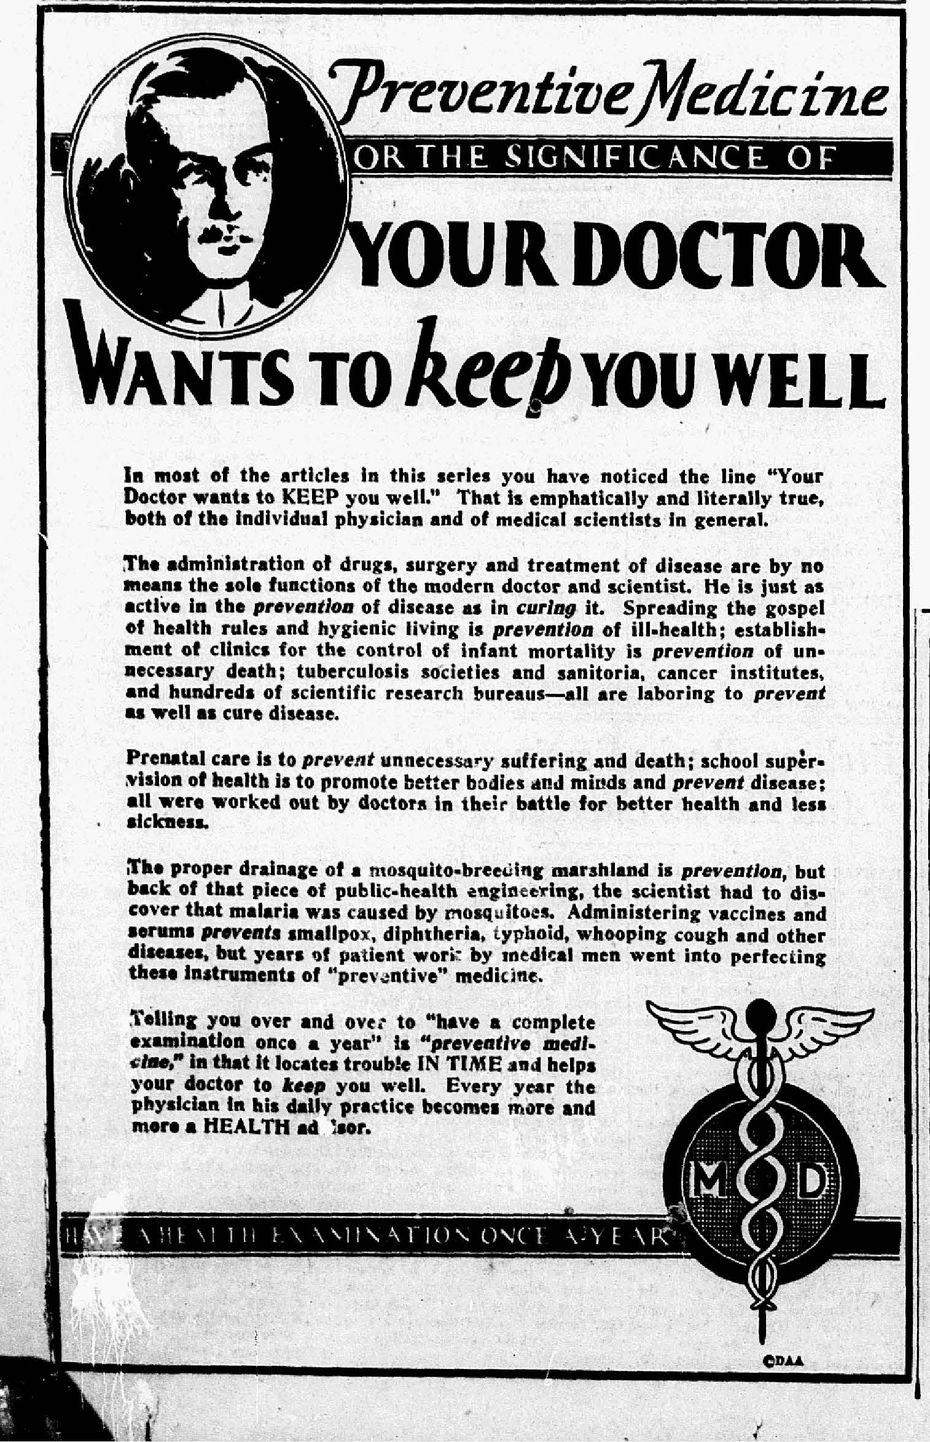 Preventive medicine advertisement published on January 9, 1933.